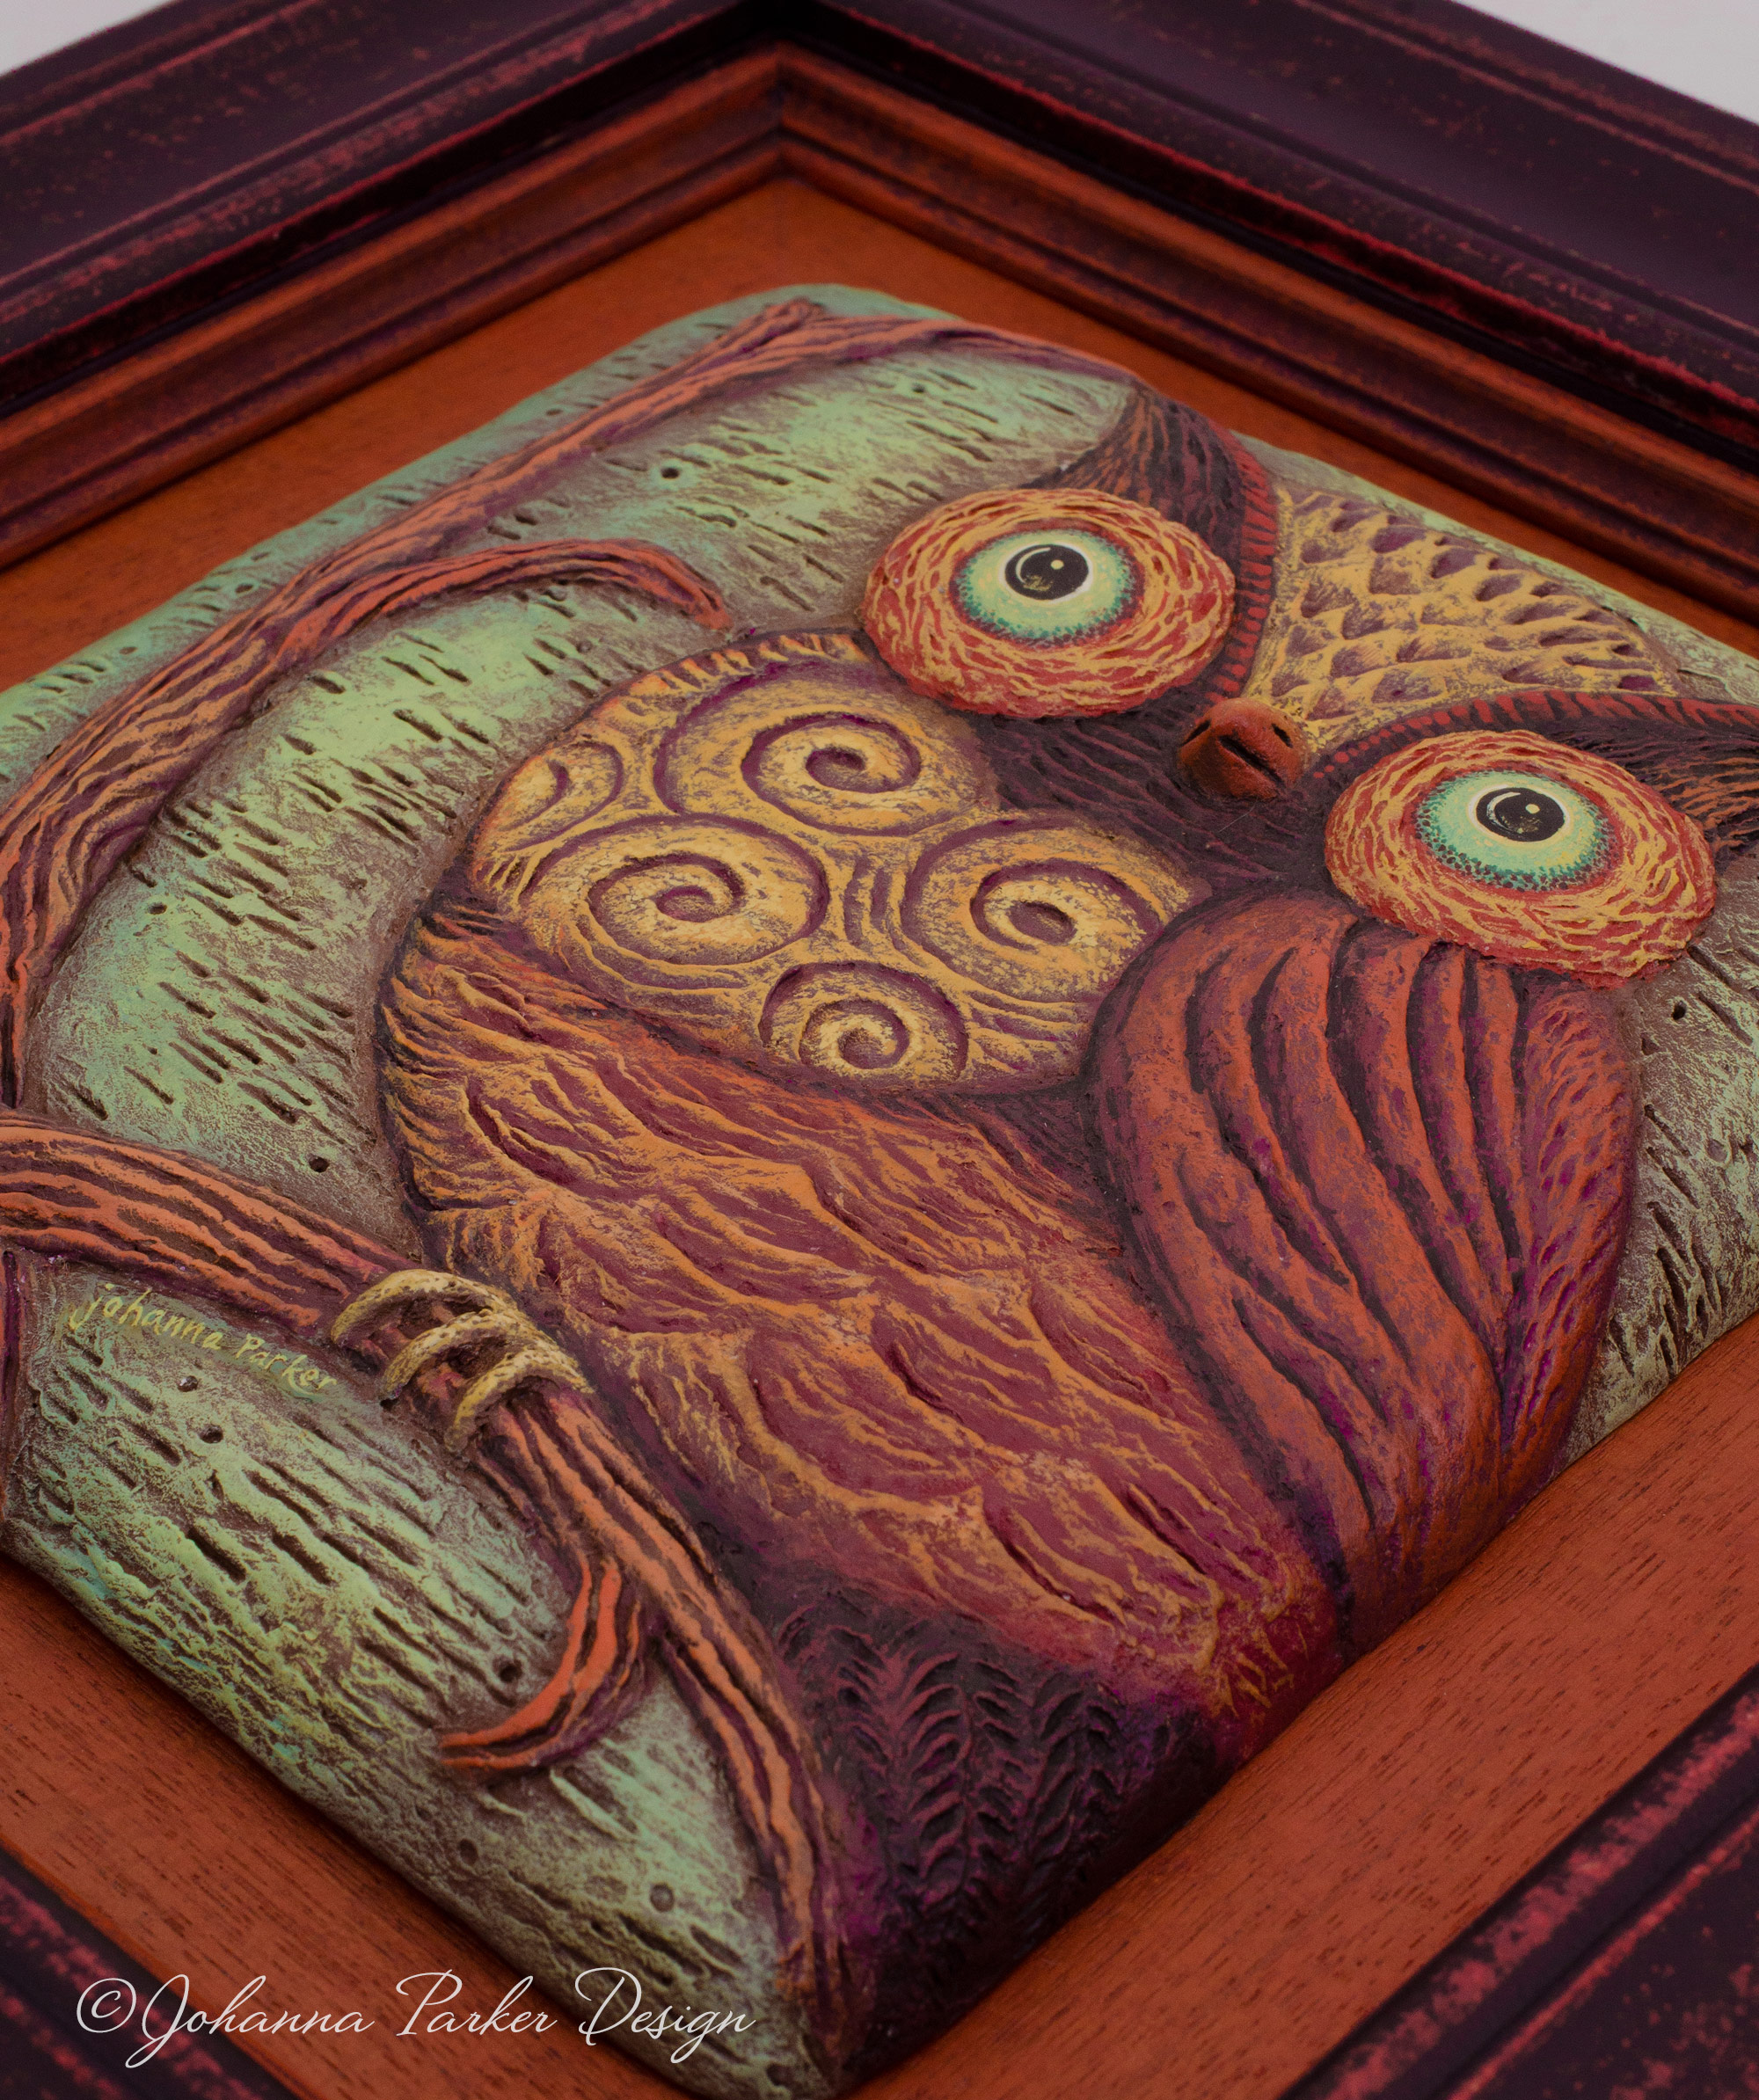 Perched owl artscape